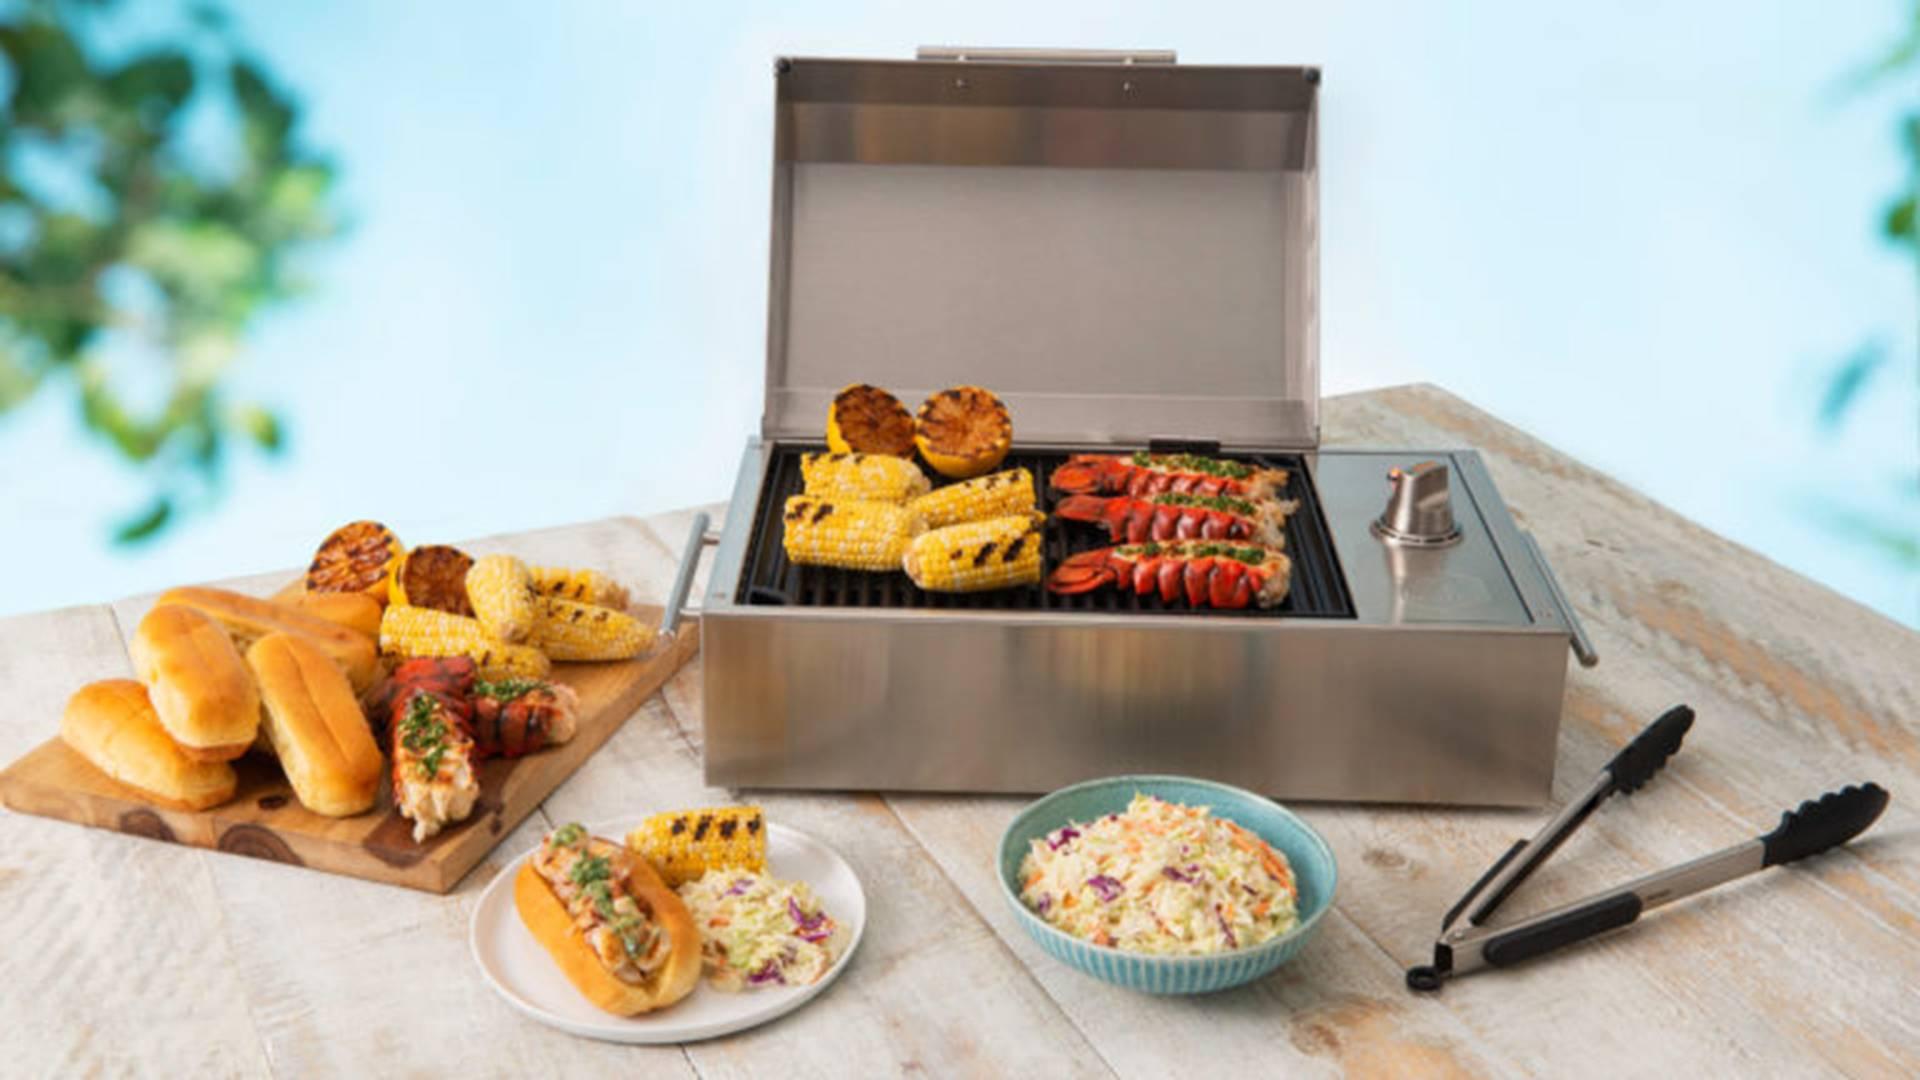 Kenyon电烧烤架,解决家中没有烧烤氛围的情况